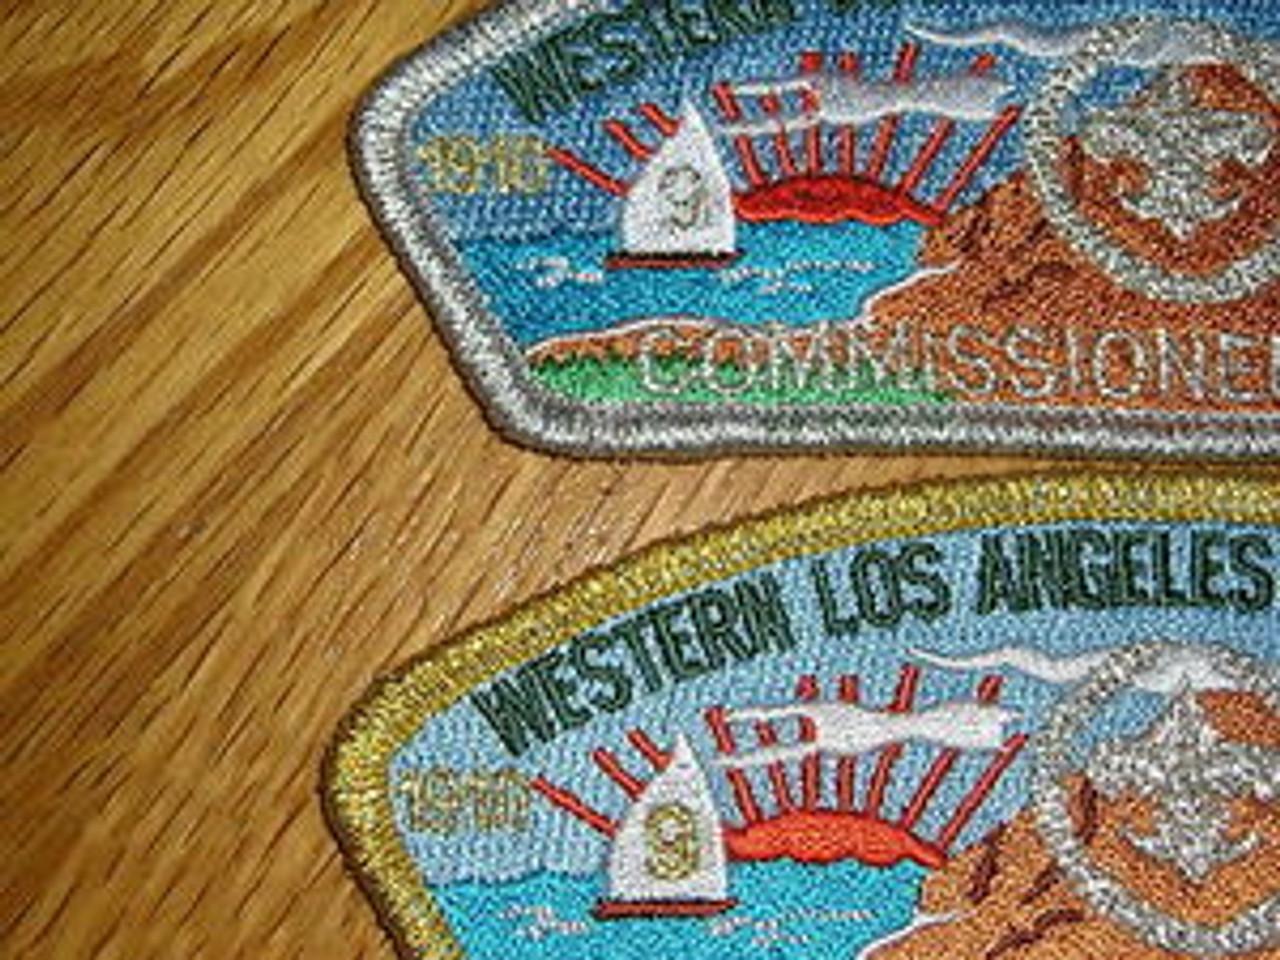 Western L.A. County Cncl sa38/sa39 COMMMISSIONER CSP 3&4, 2010 100th Anniv